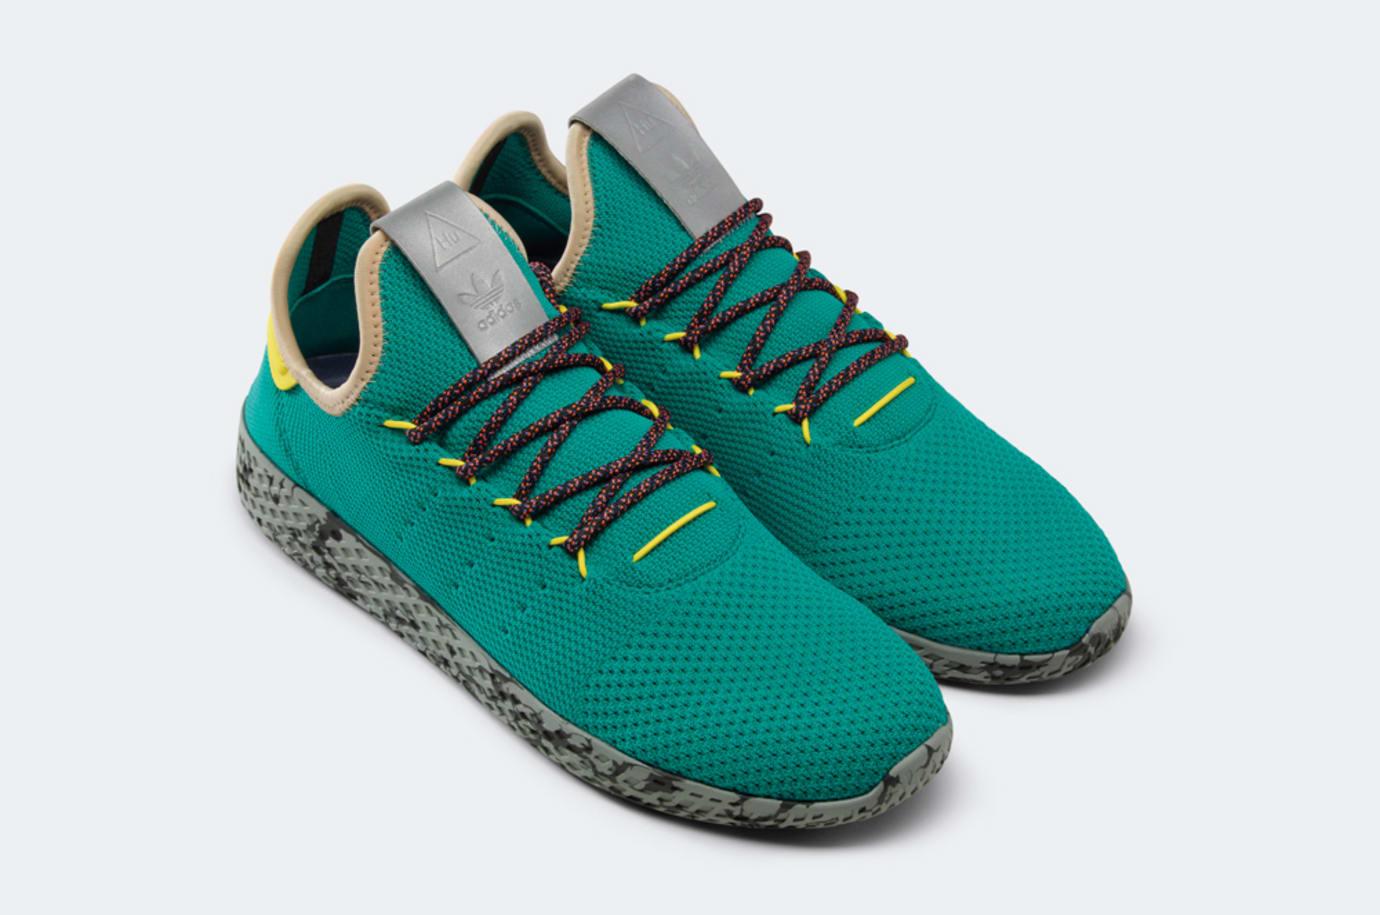 Adidas Tennis Hu GQ1871